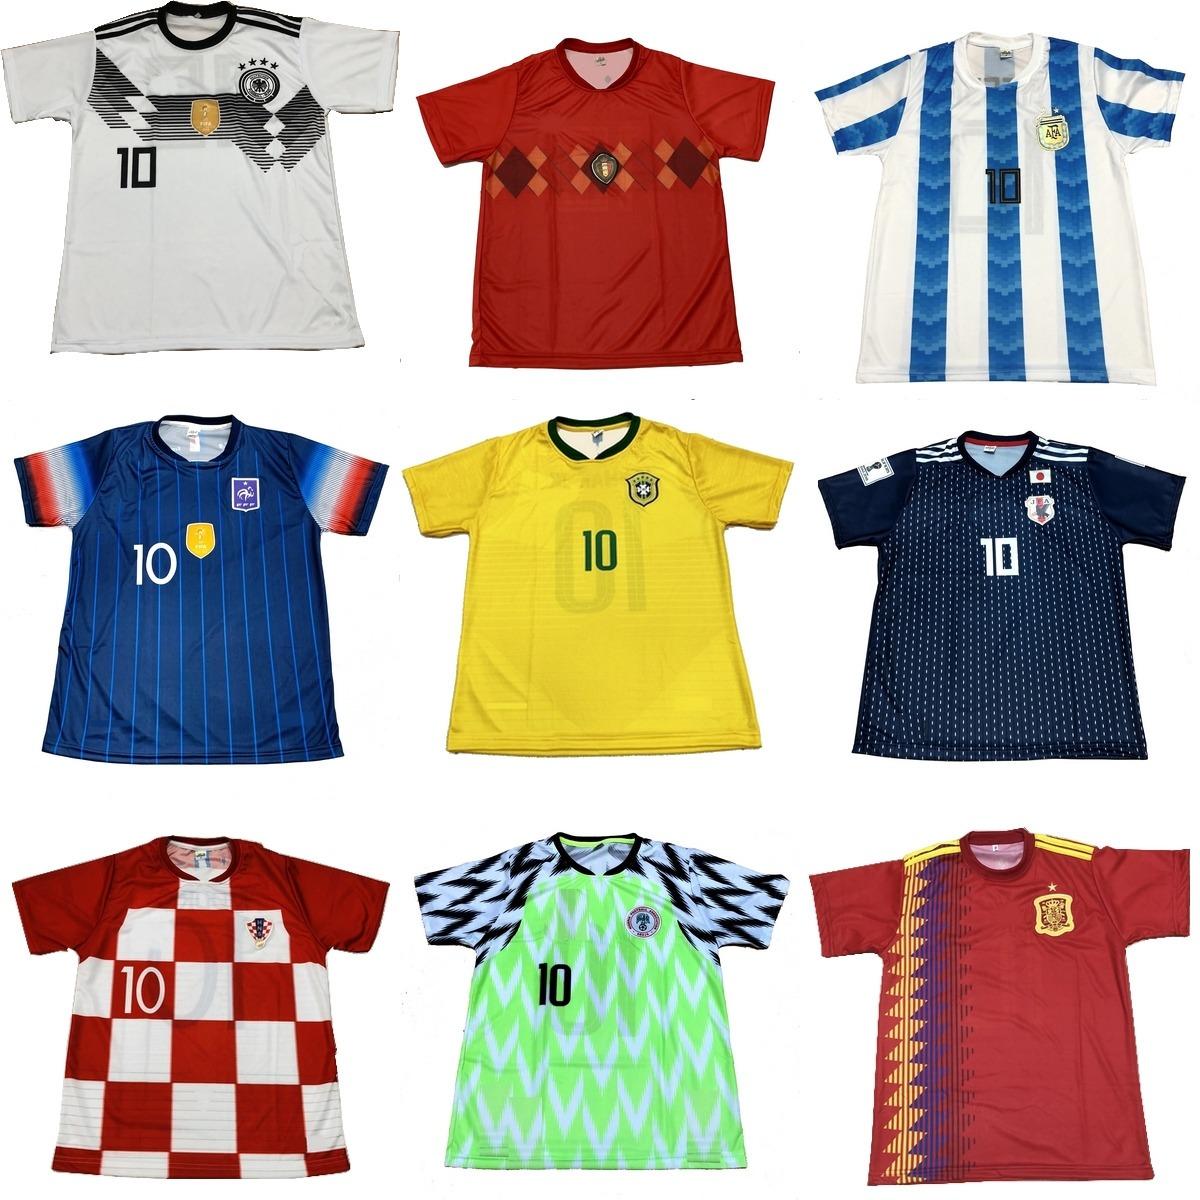 e71a8b0602c7c 10 camisetas de time atacado seleçao europeus 2019 barato. Carregando zoom.